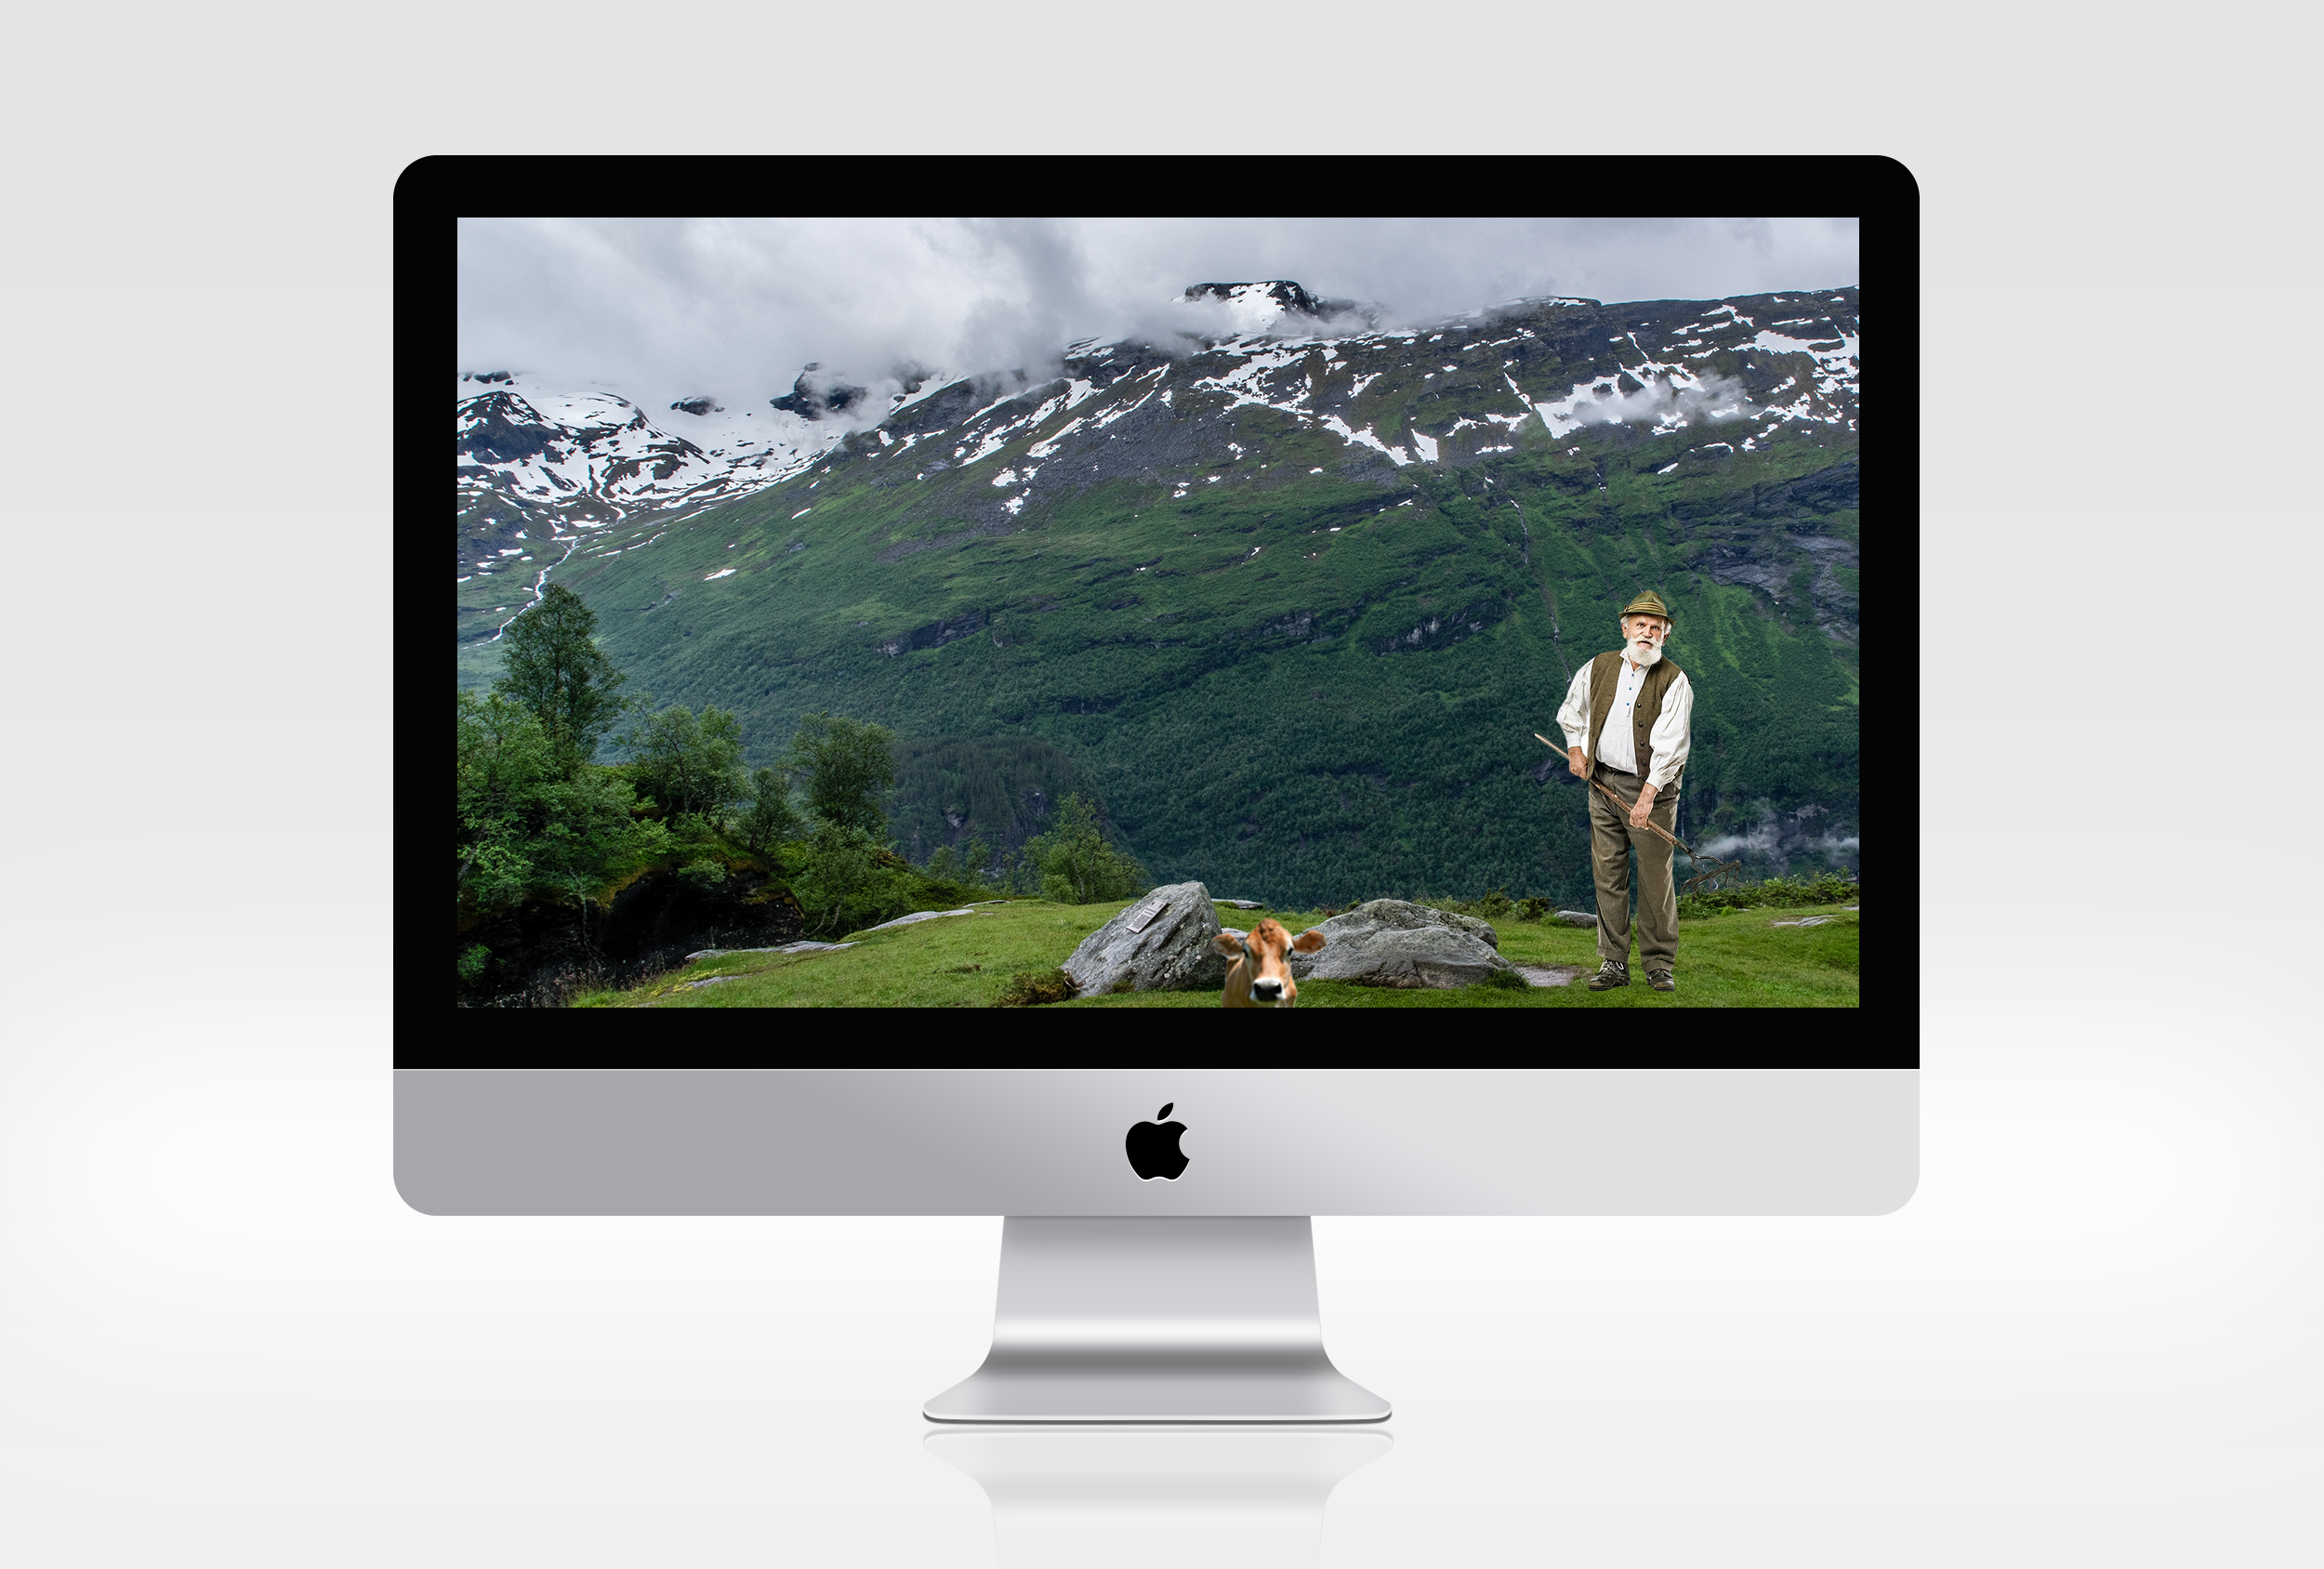 iMac-psd-mockup-template-9.png